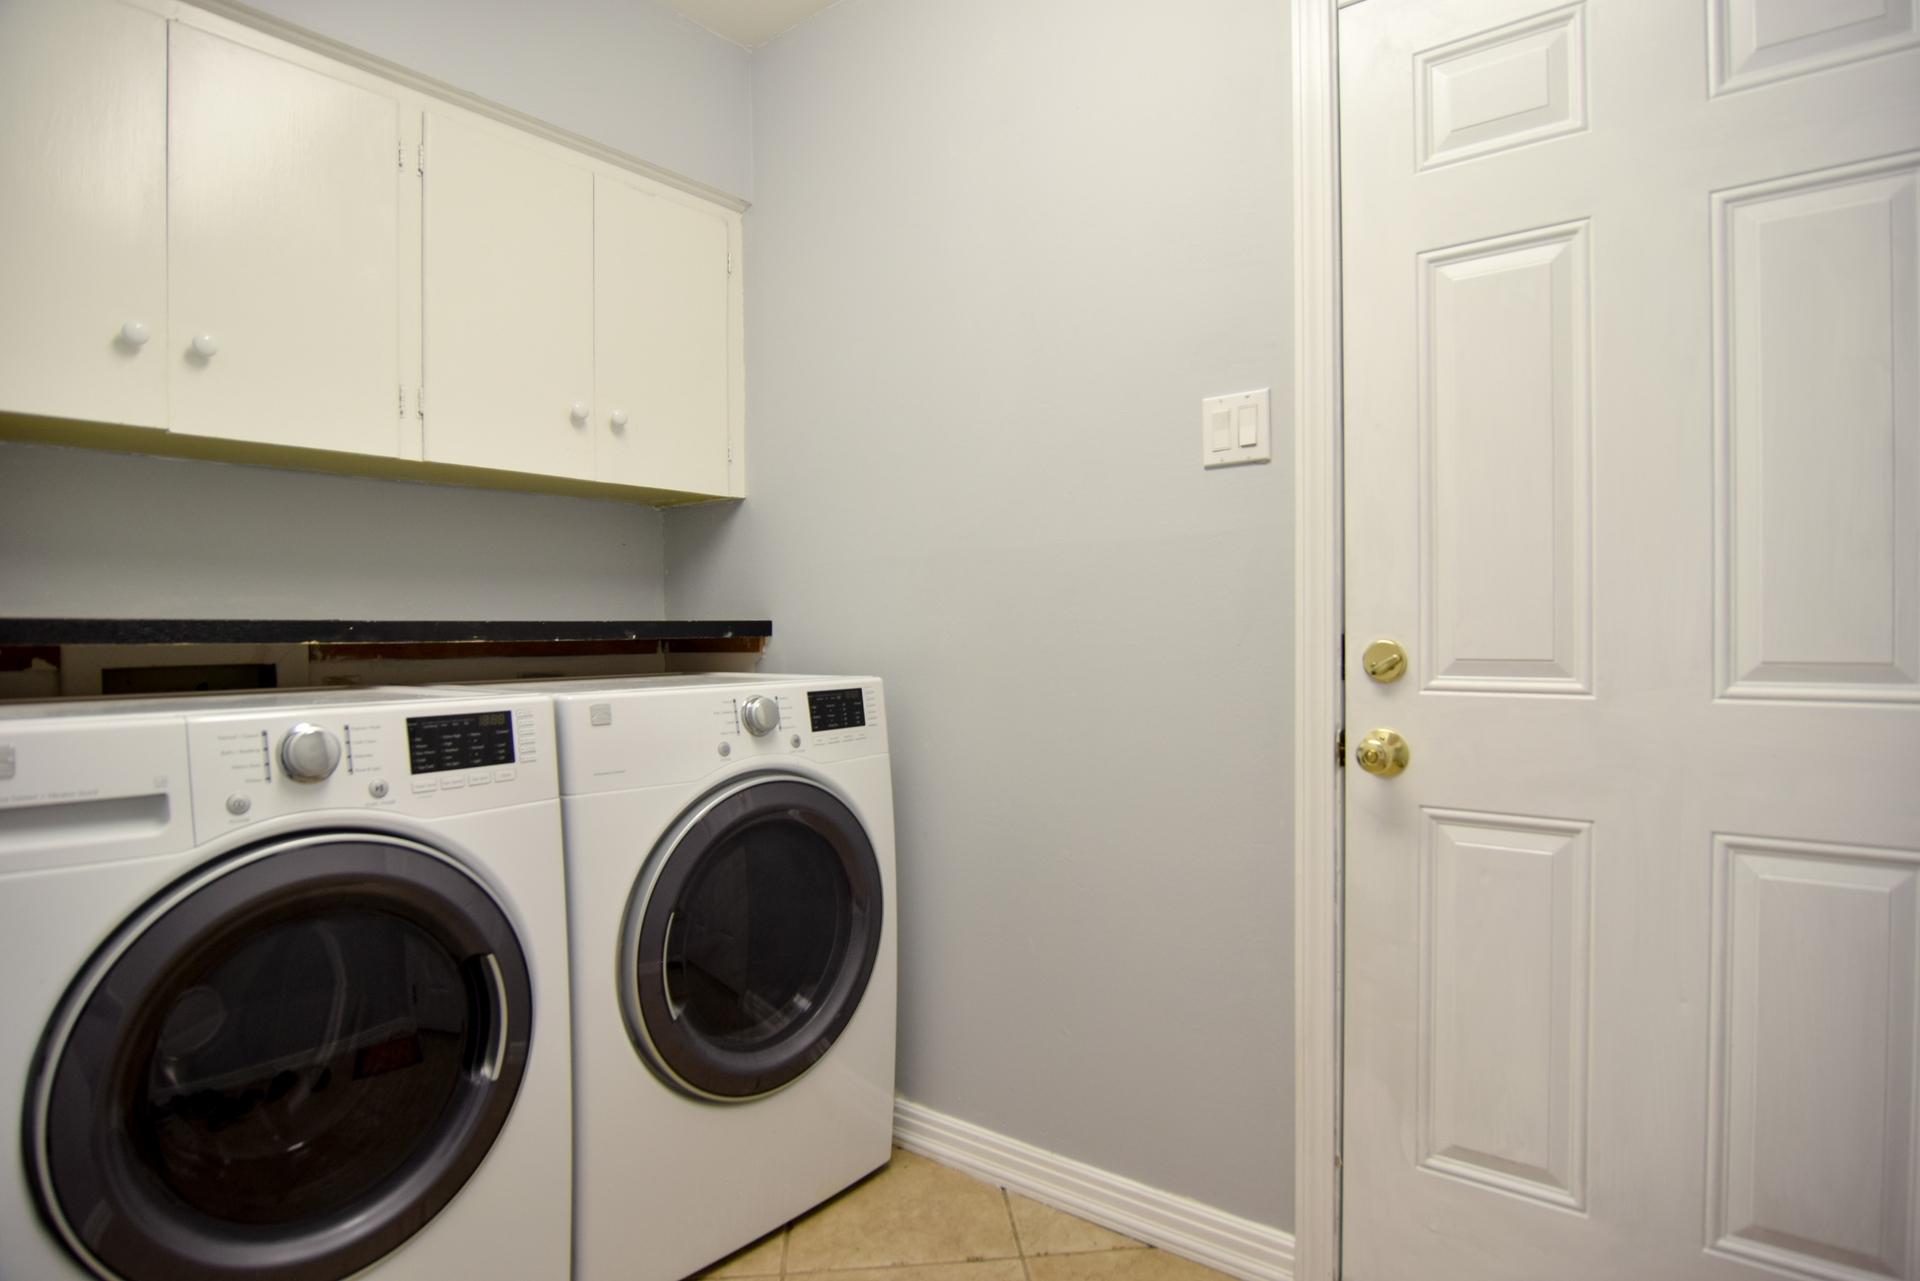 Laundry 3163 Citation Dr Dallas TX 75229.jpg